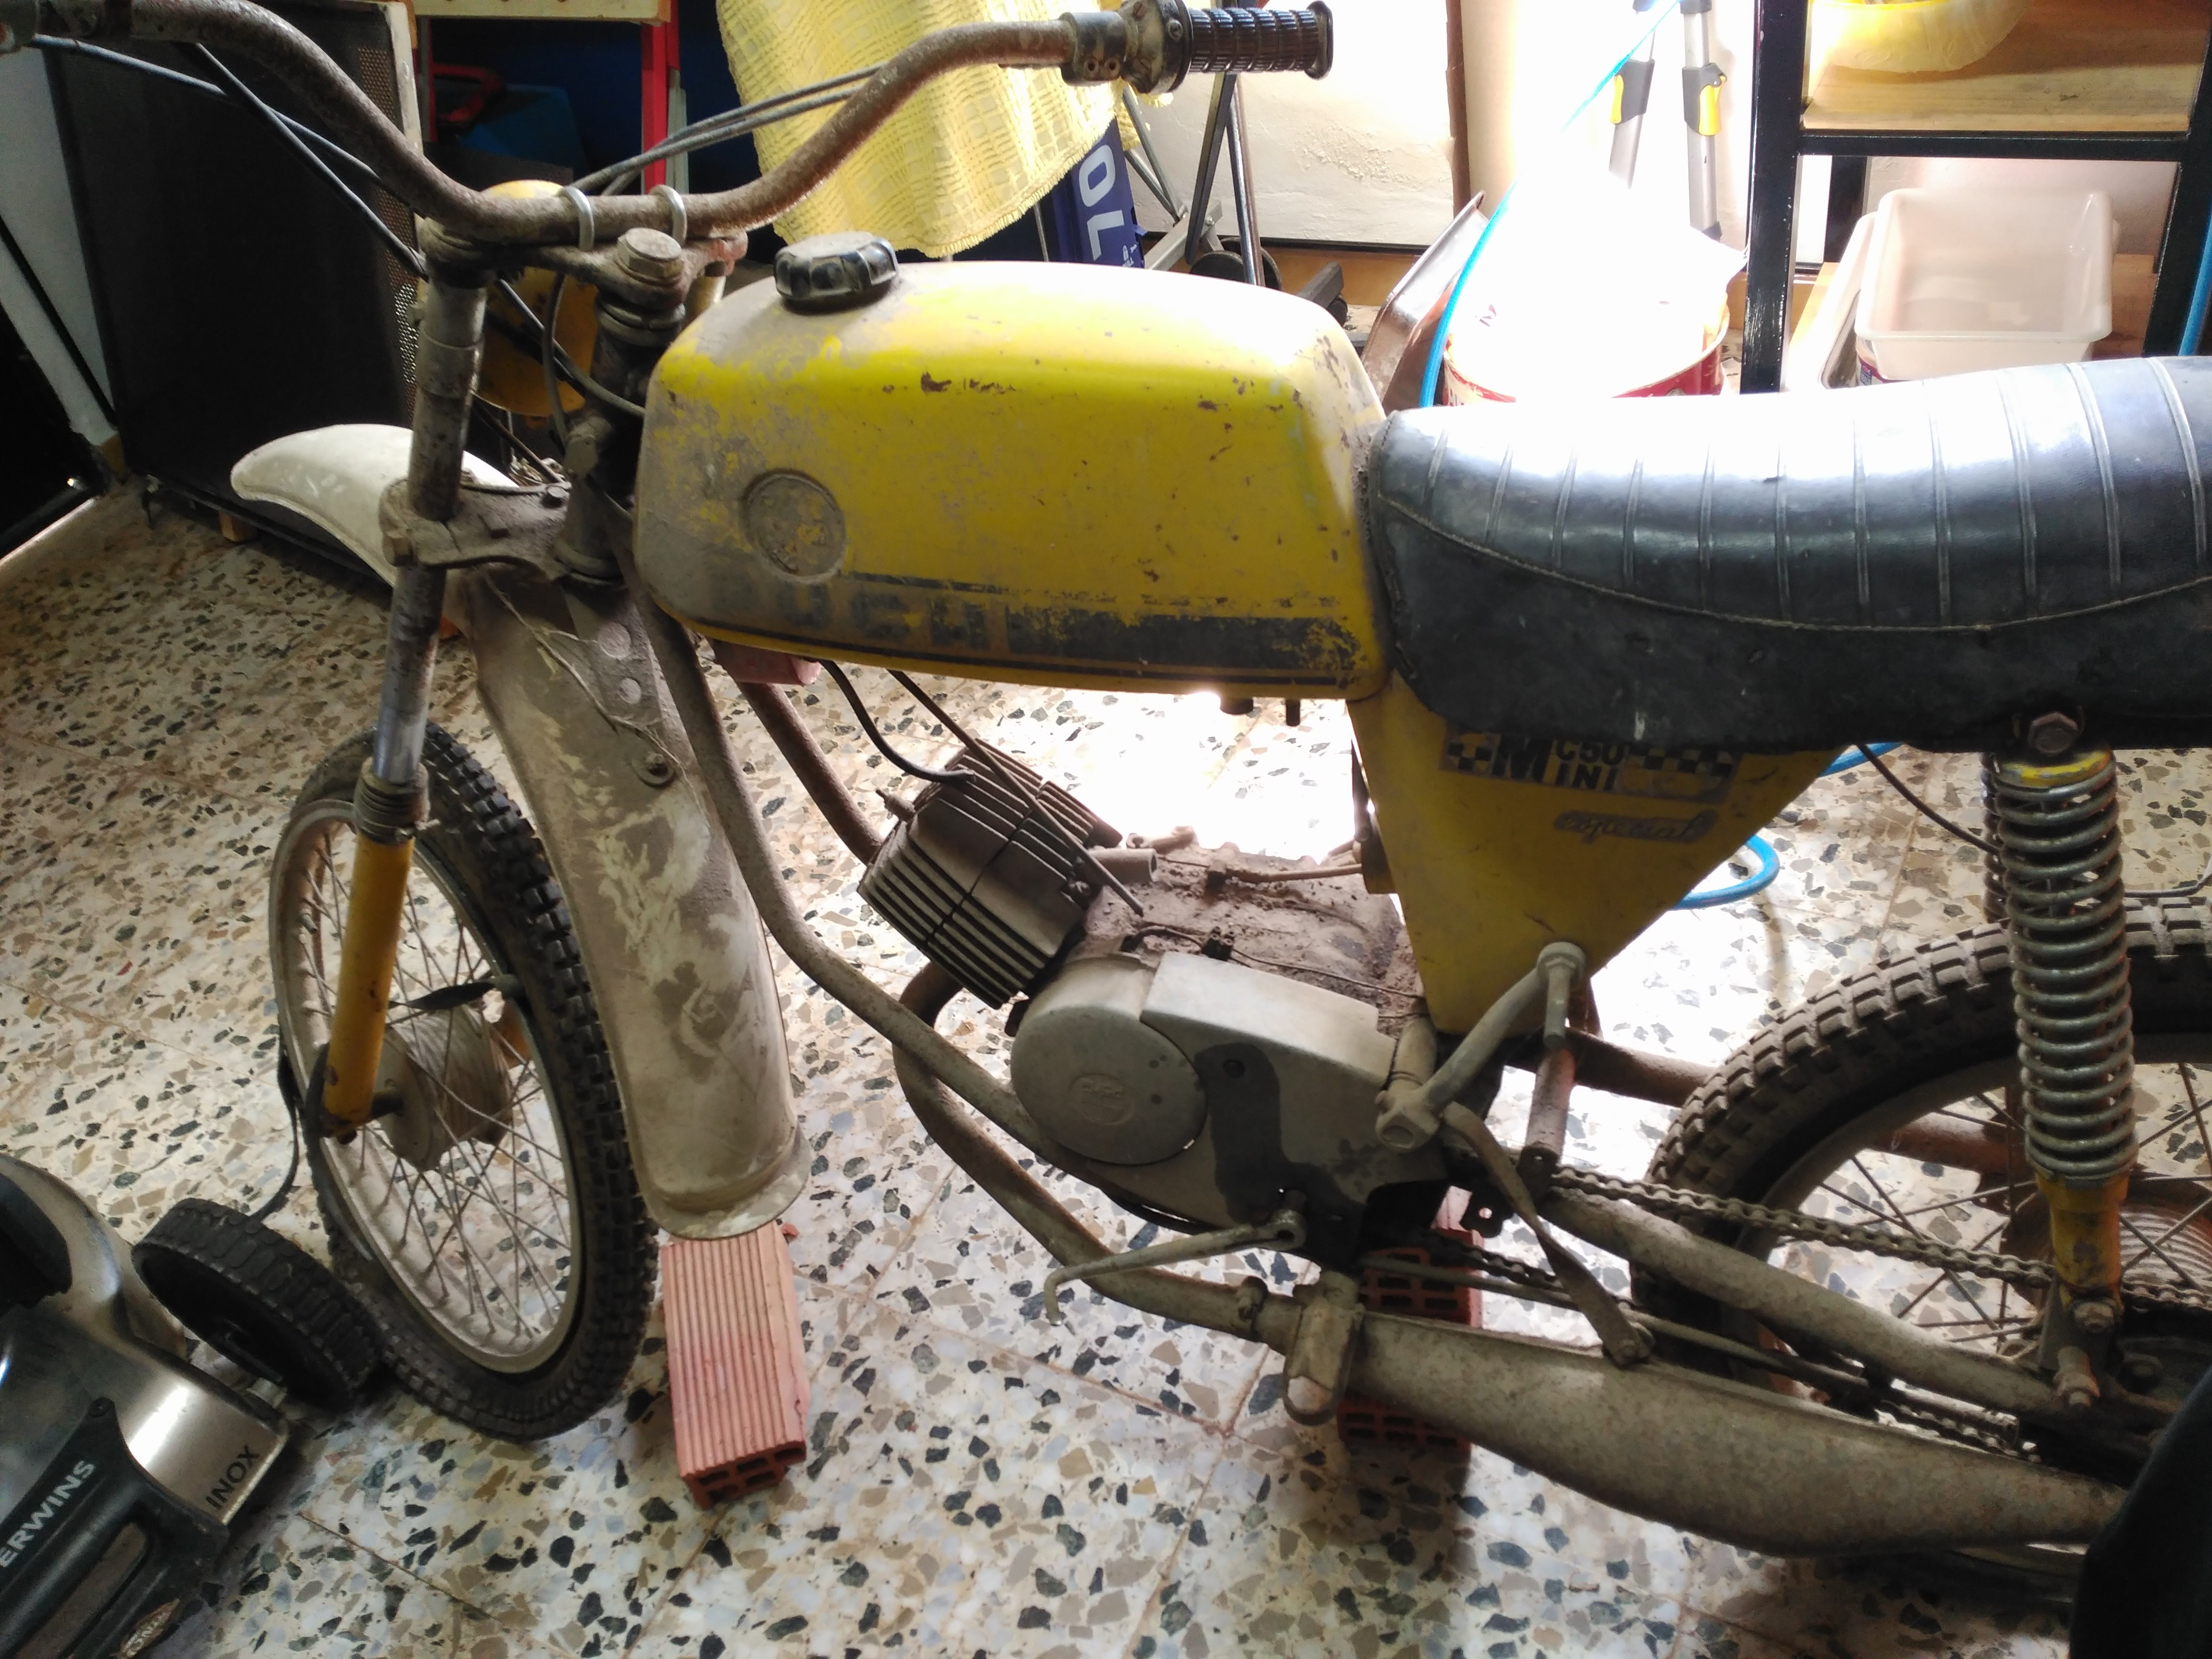 Restauración Puch Minicross 50 Mini Especial JldbLT